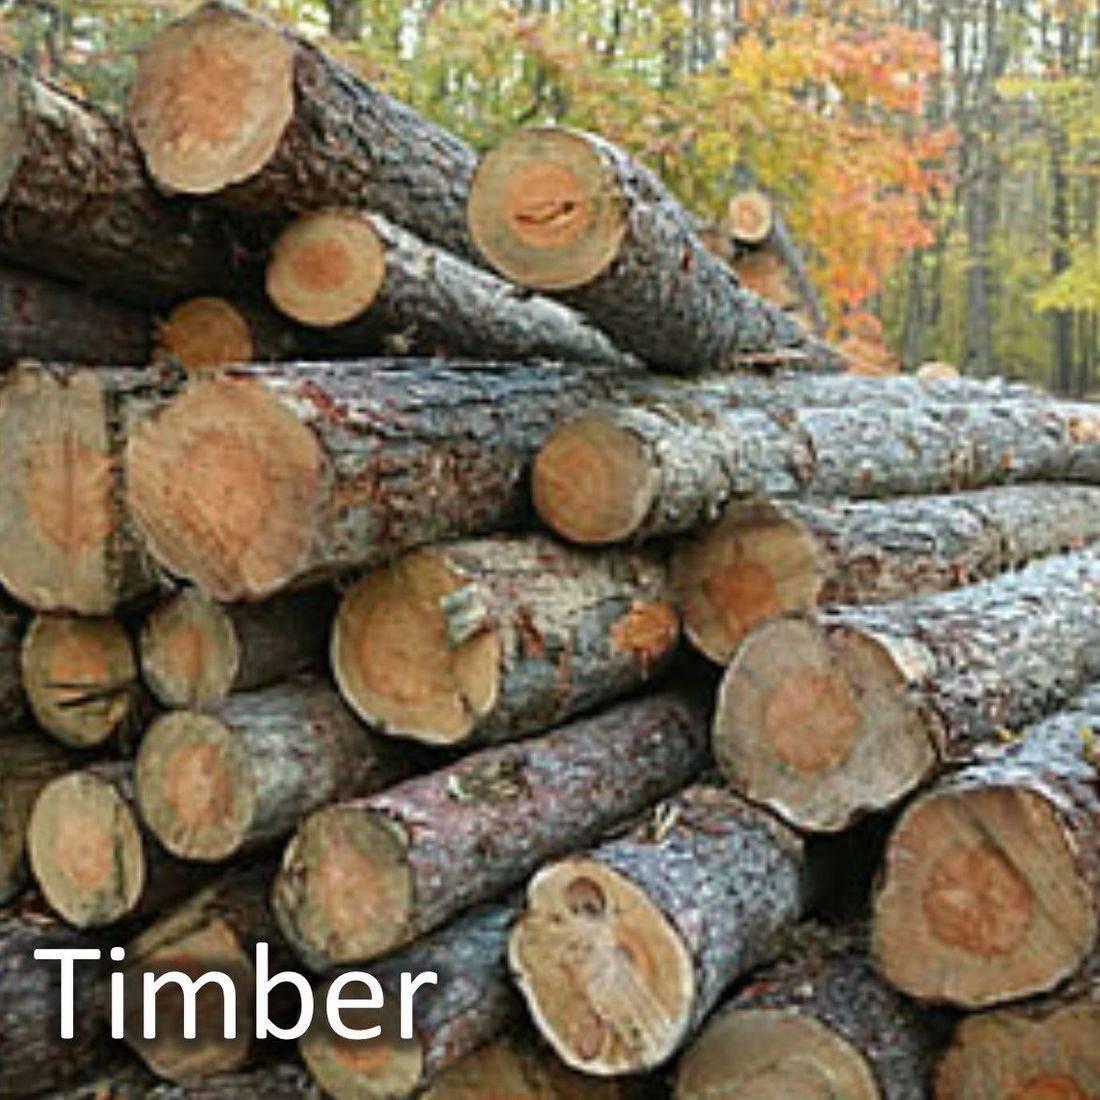 Timber, Lumber and Wood